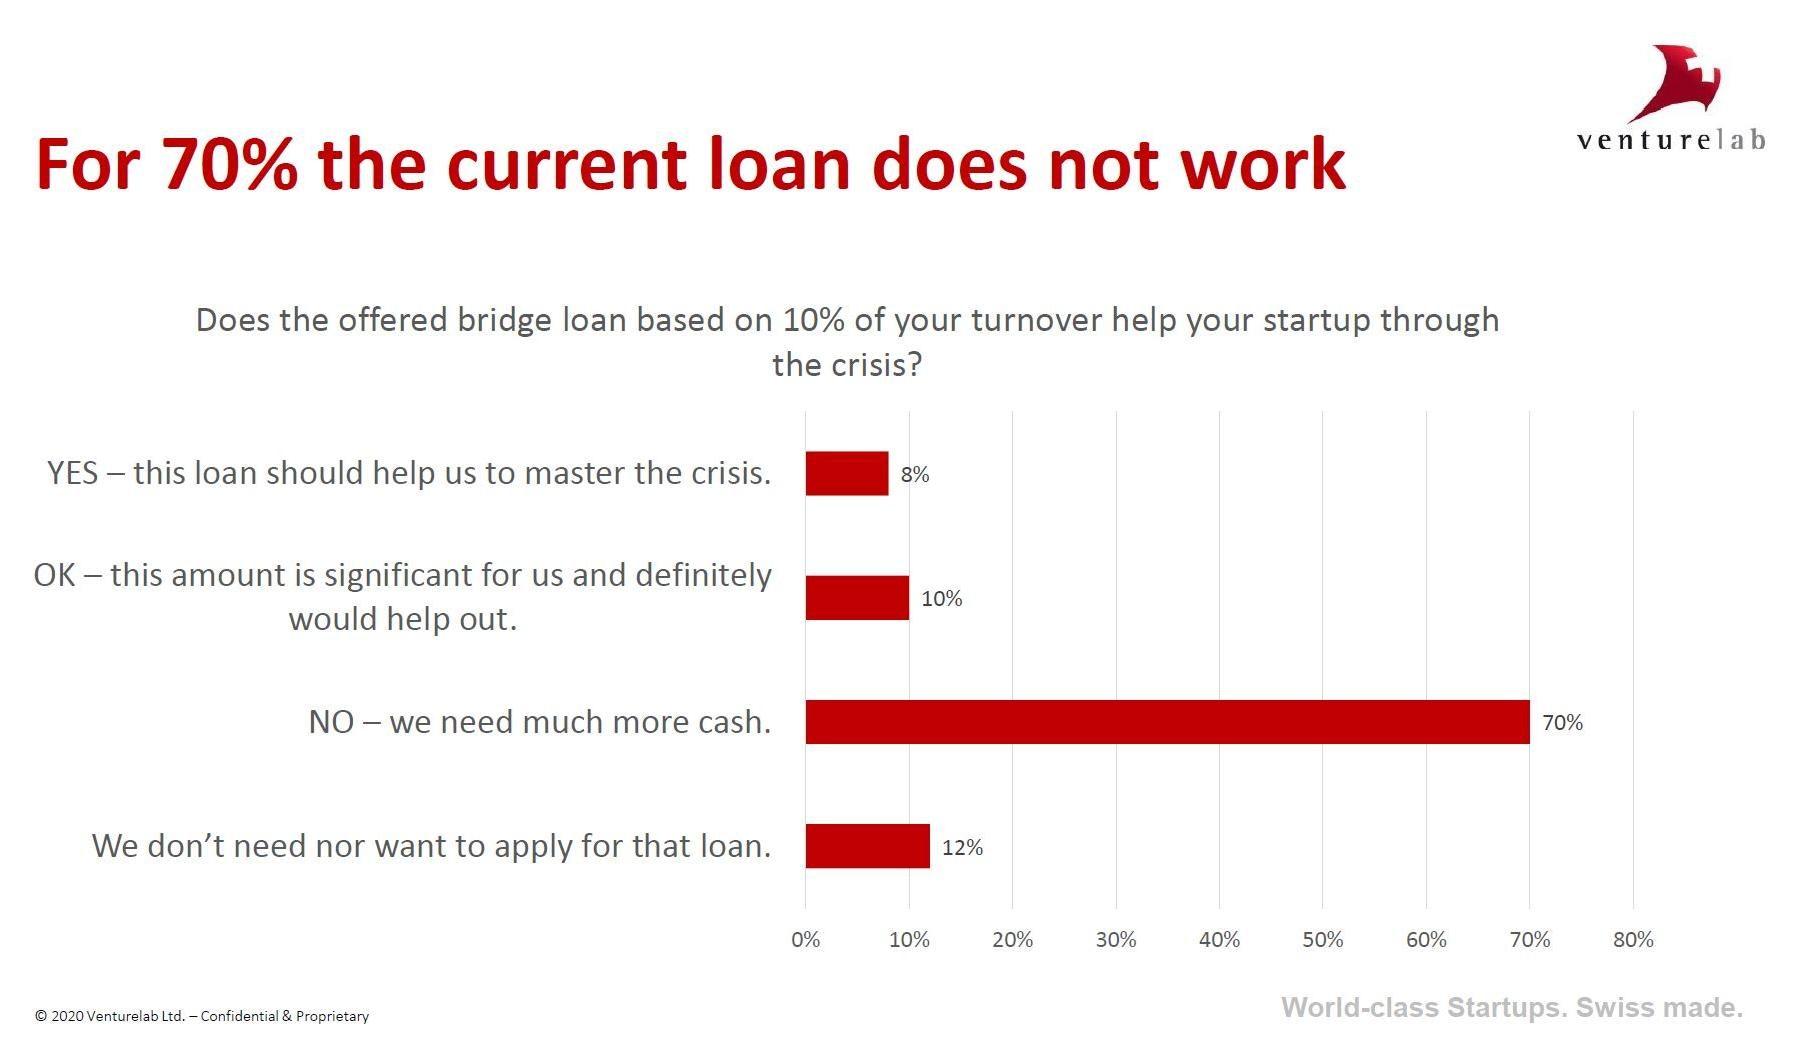 Coronavirus survey: 70% of Swiss startups do not benefit from bridging loans